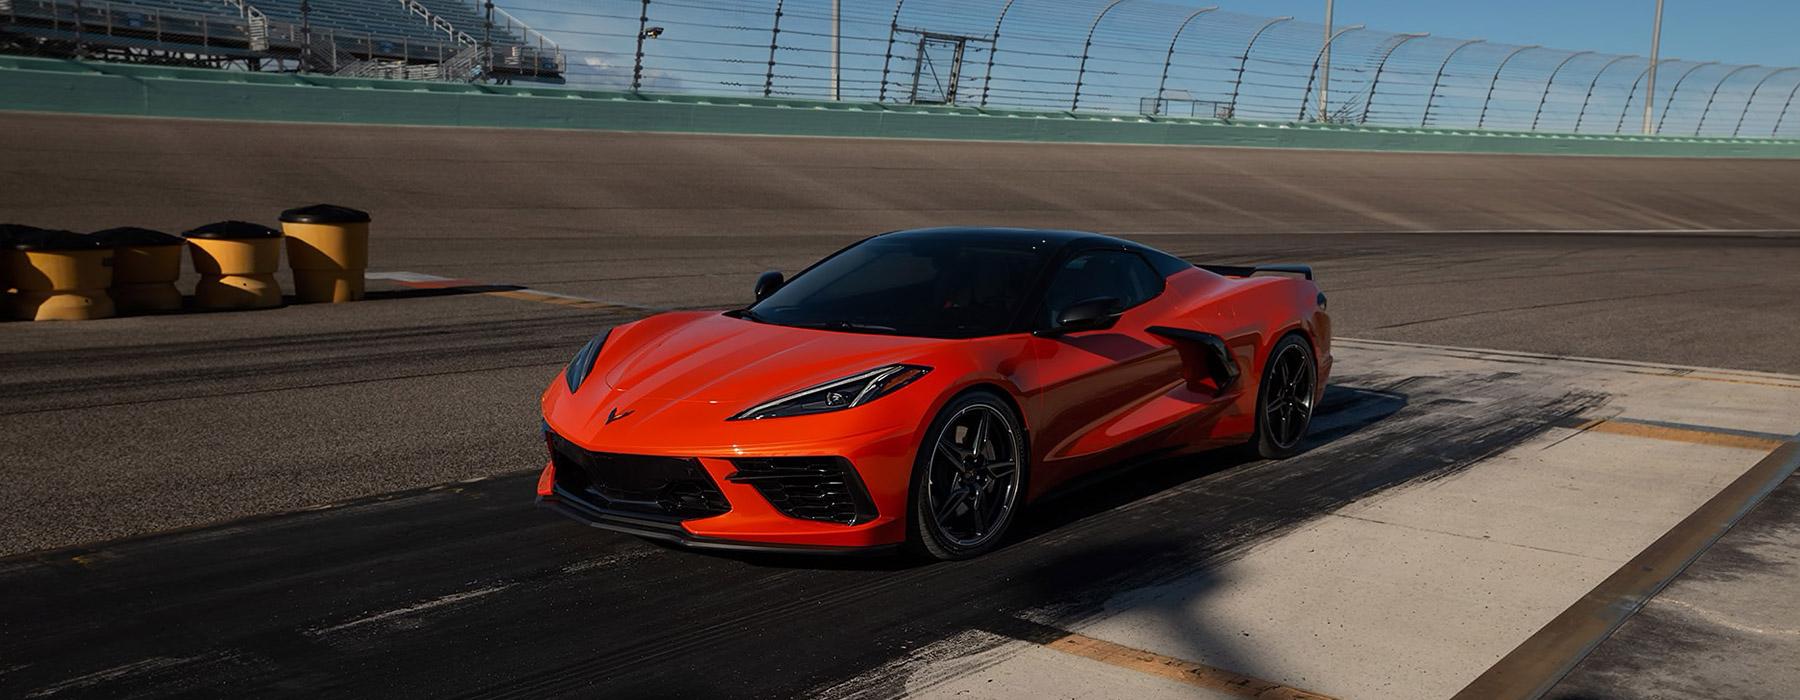 Drive a Corvette C8